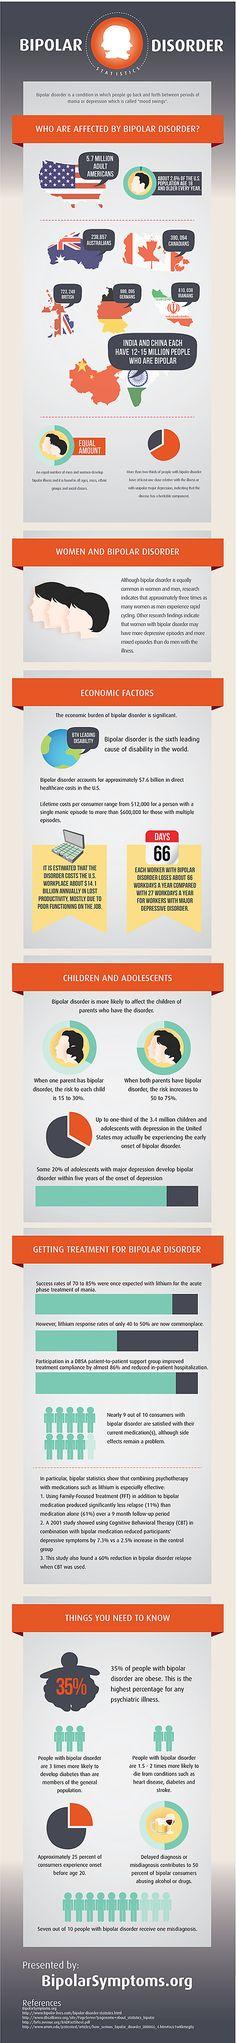 Bipolar Disorder Statistics Infographic